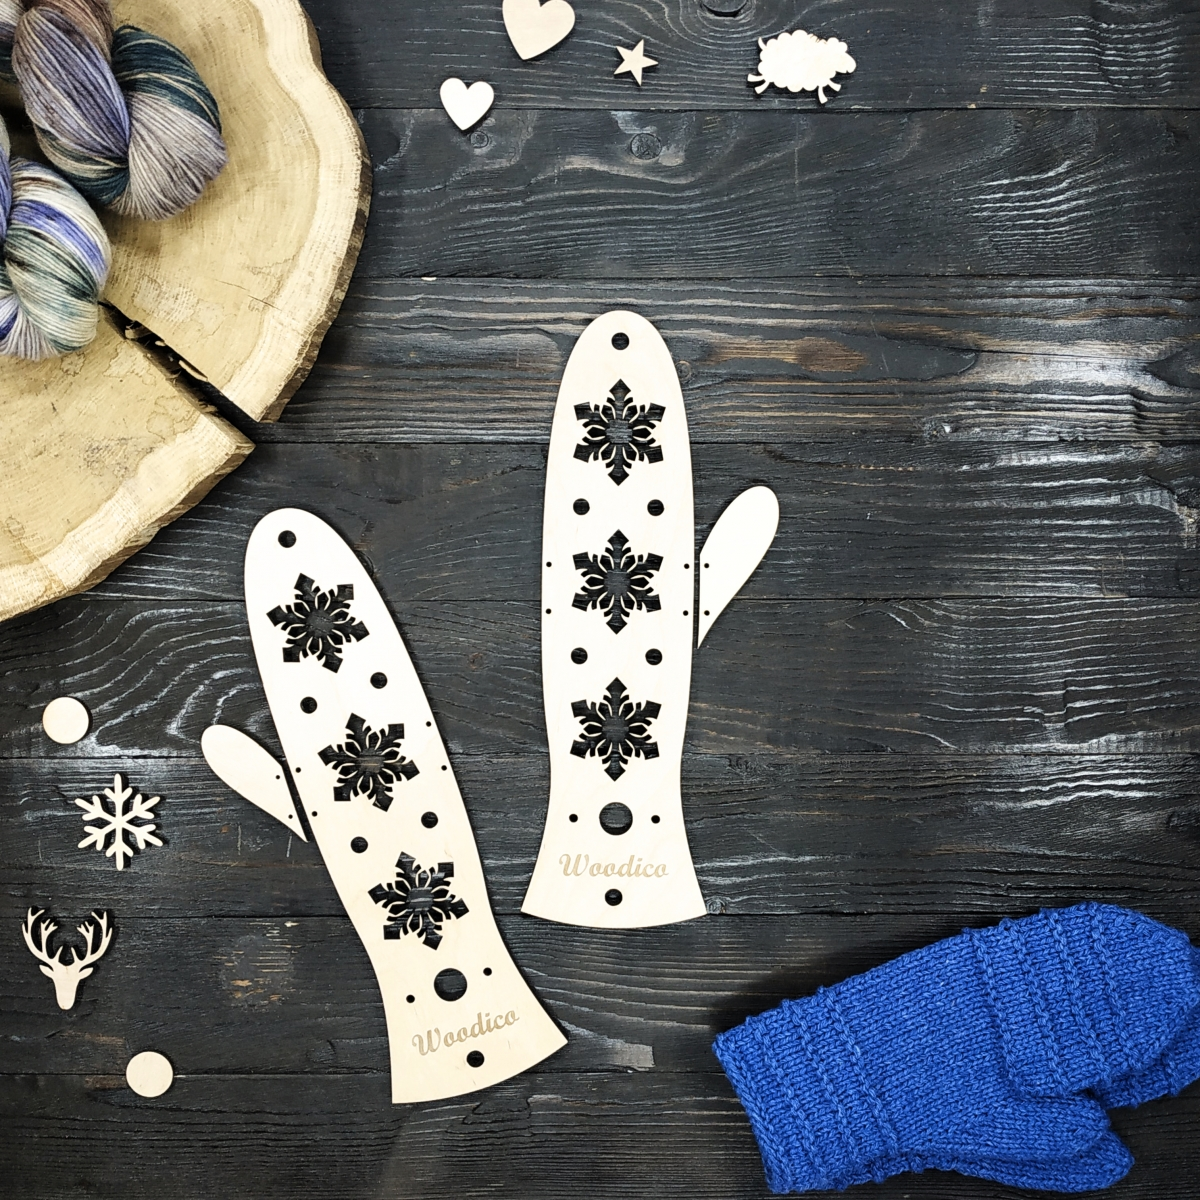 woodico.pro wooden mitten blockers ice 1 1200x1200 - Wooden mitten blockers / Ice